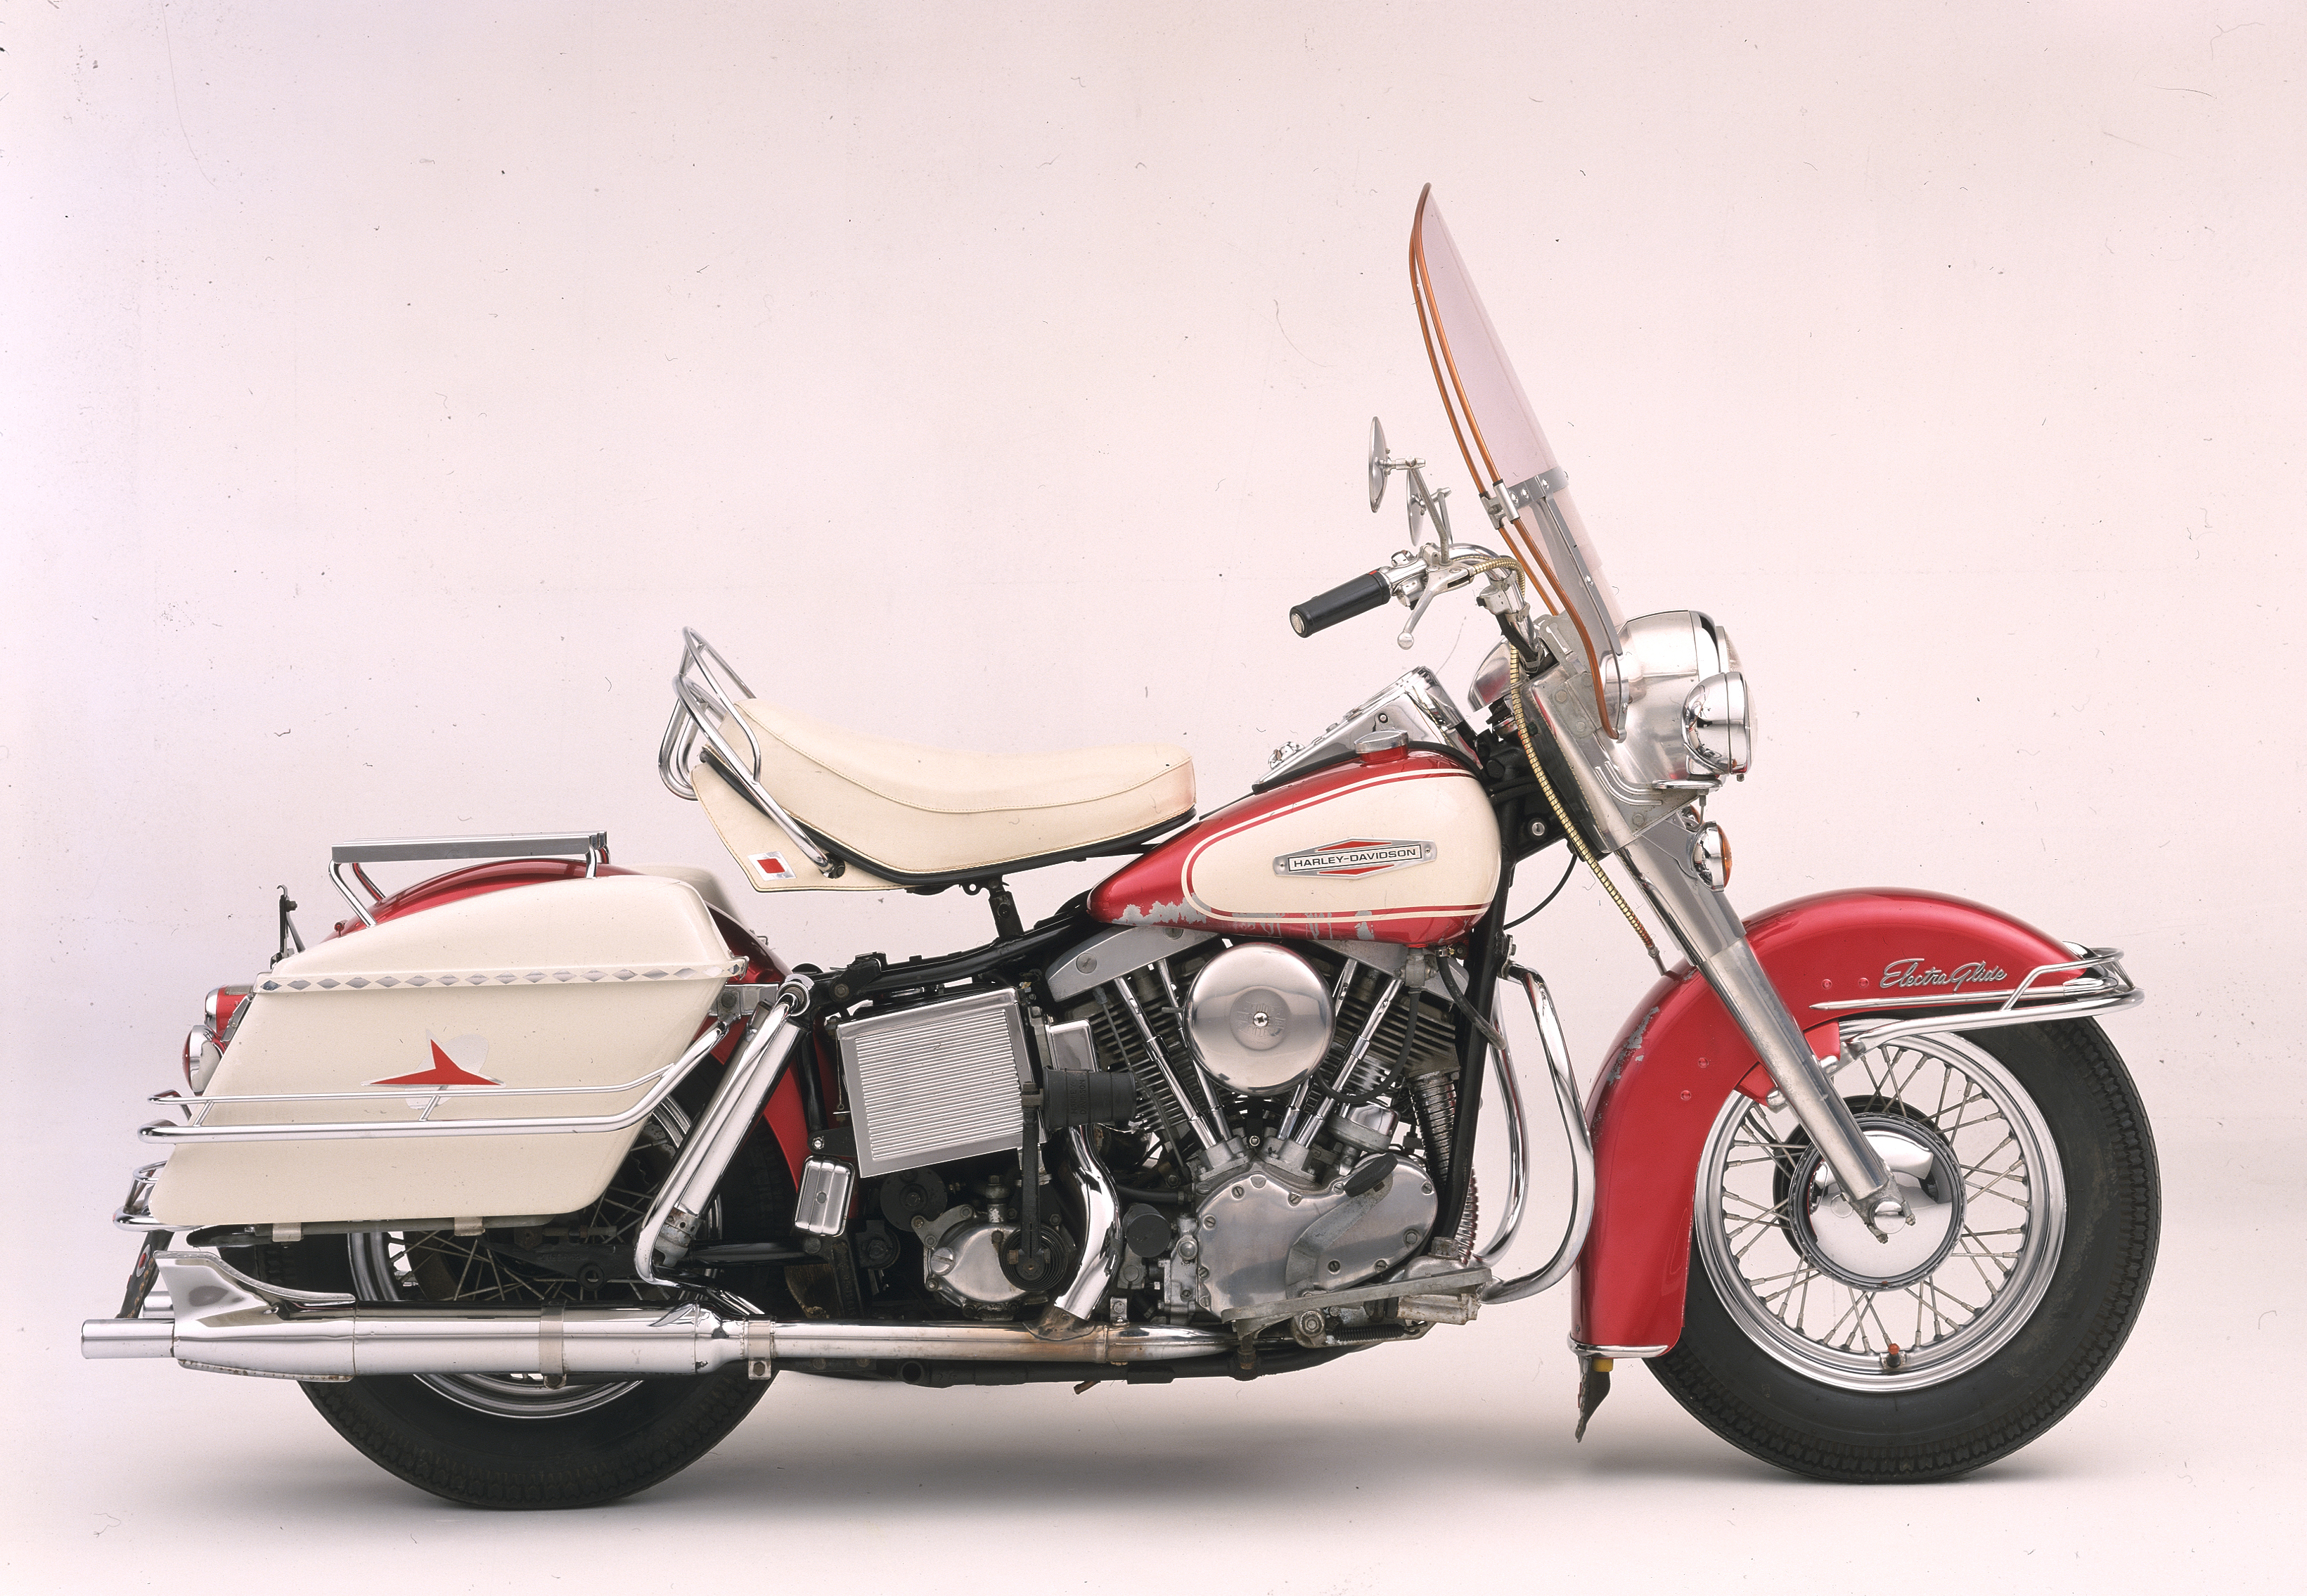 Harley-Davidson Shovelhead V-Twin Motorcycles - HISTORY OF